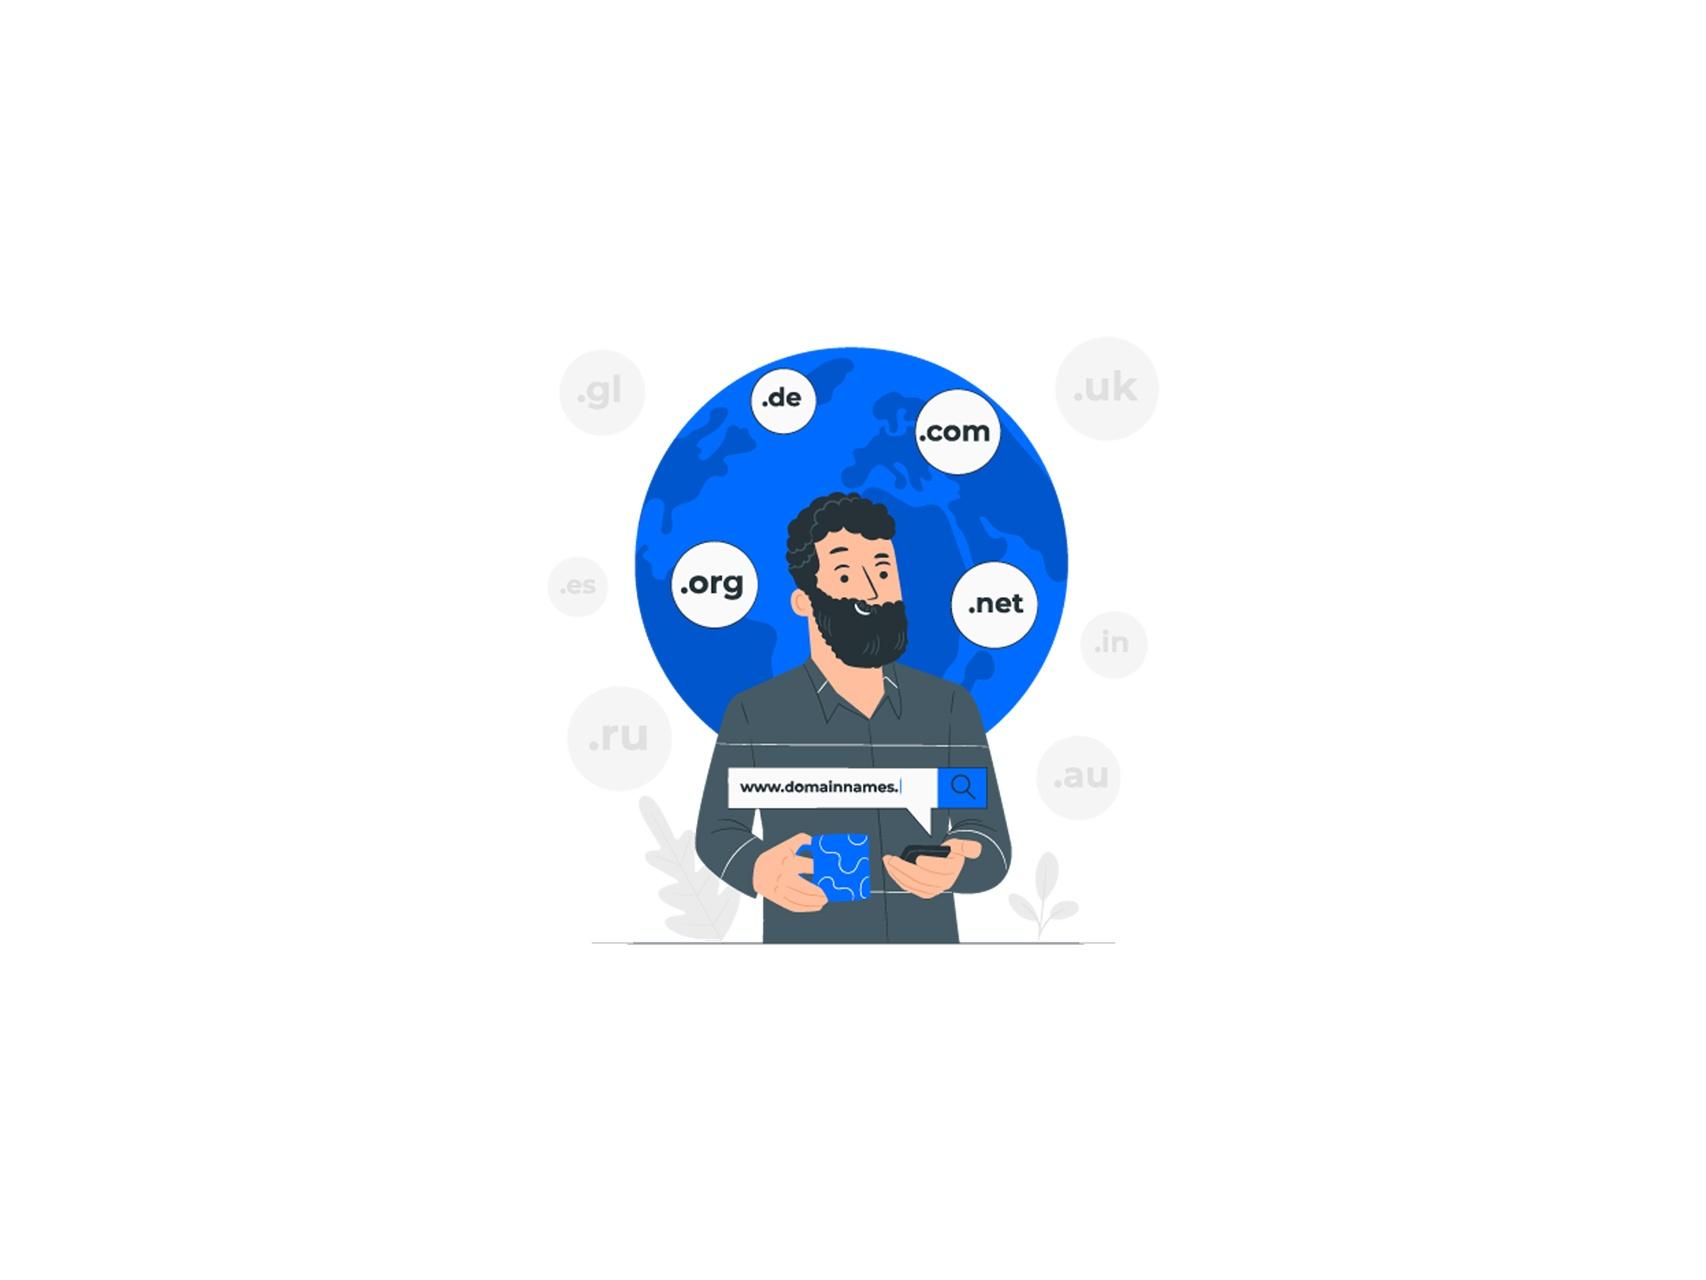 jasa web development di batam